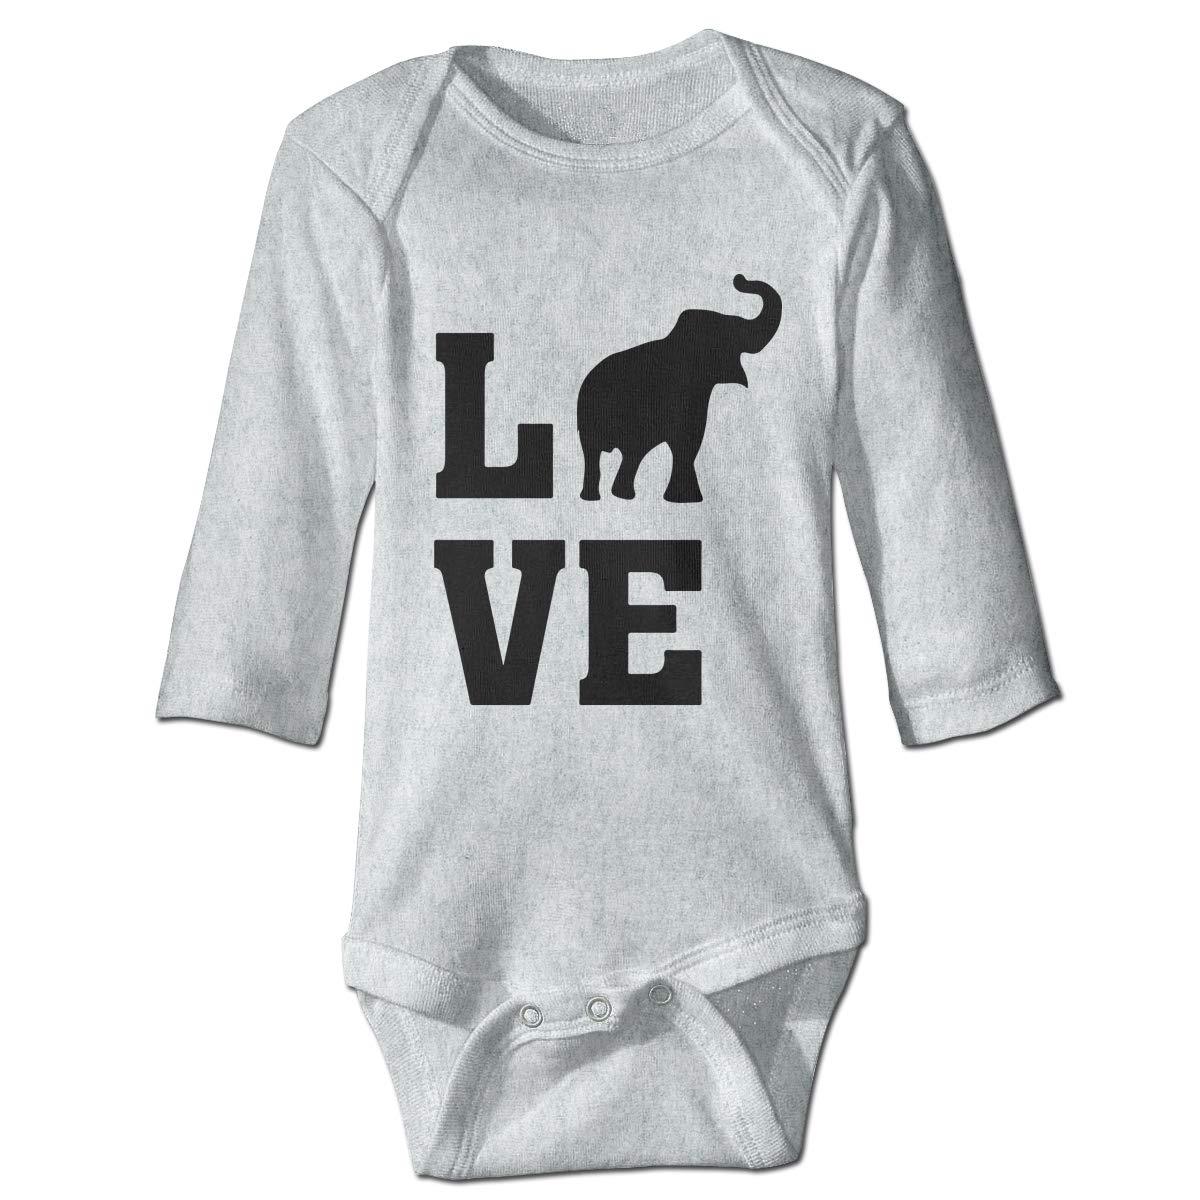 Infant Babys Long Sleeve Climb Romper I Love Elephants-1 Unisex Button Playsuit Outfit Clothes